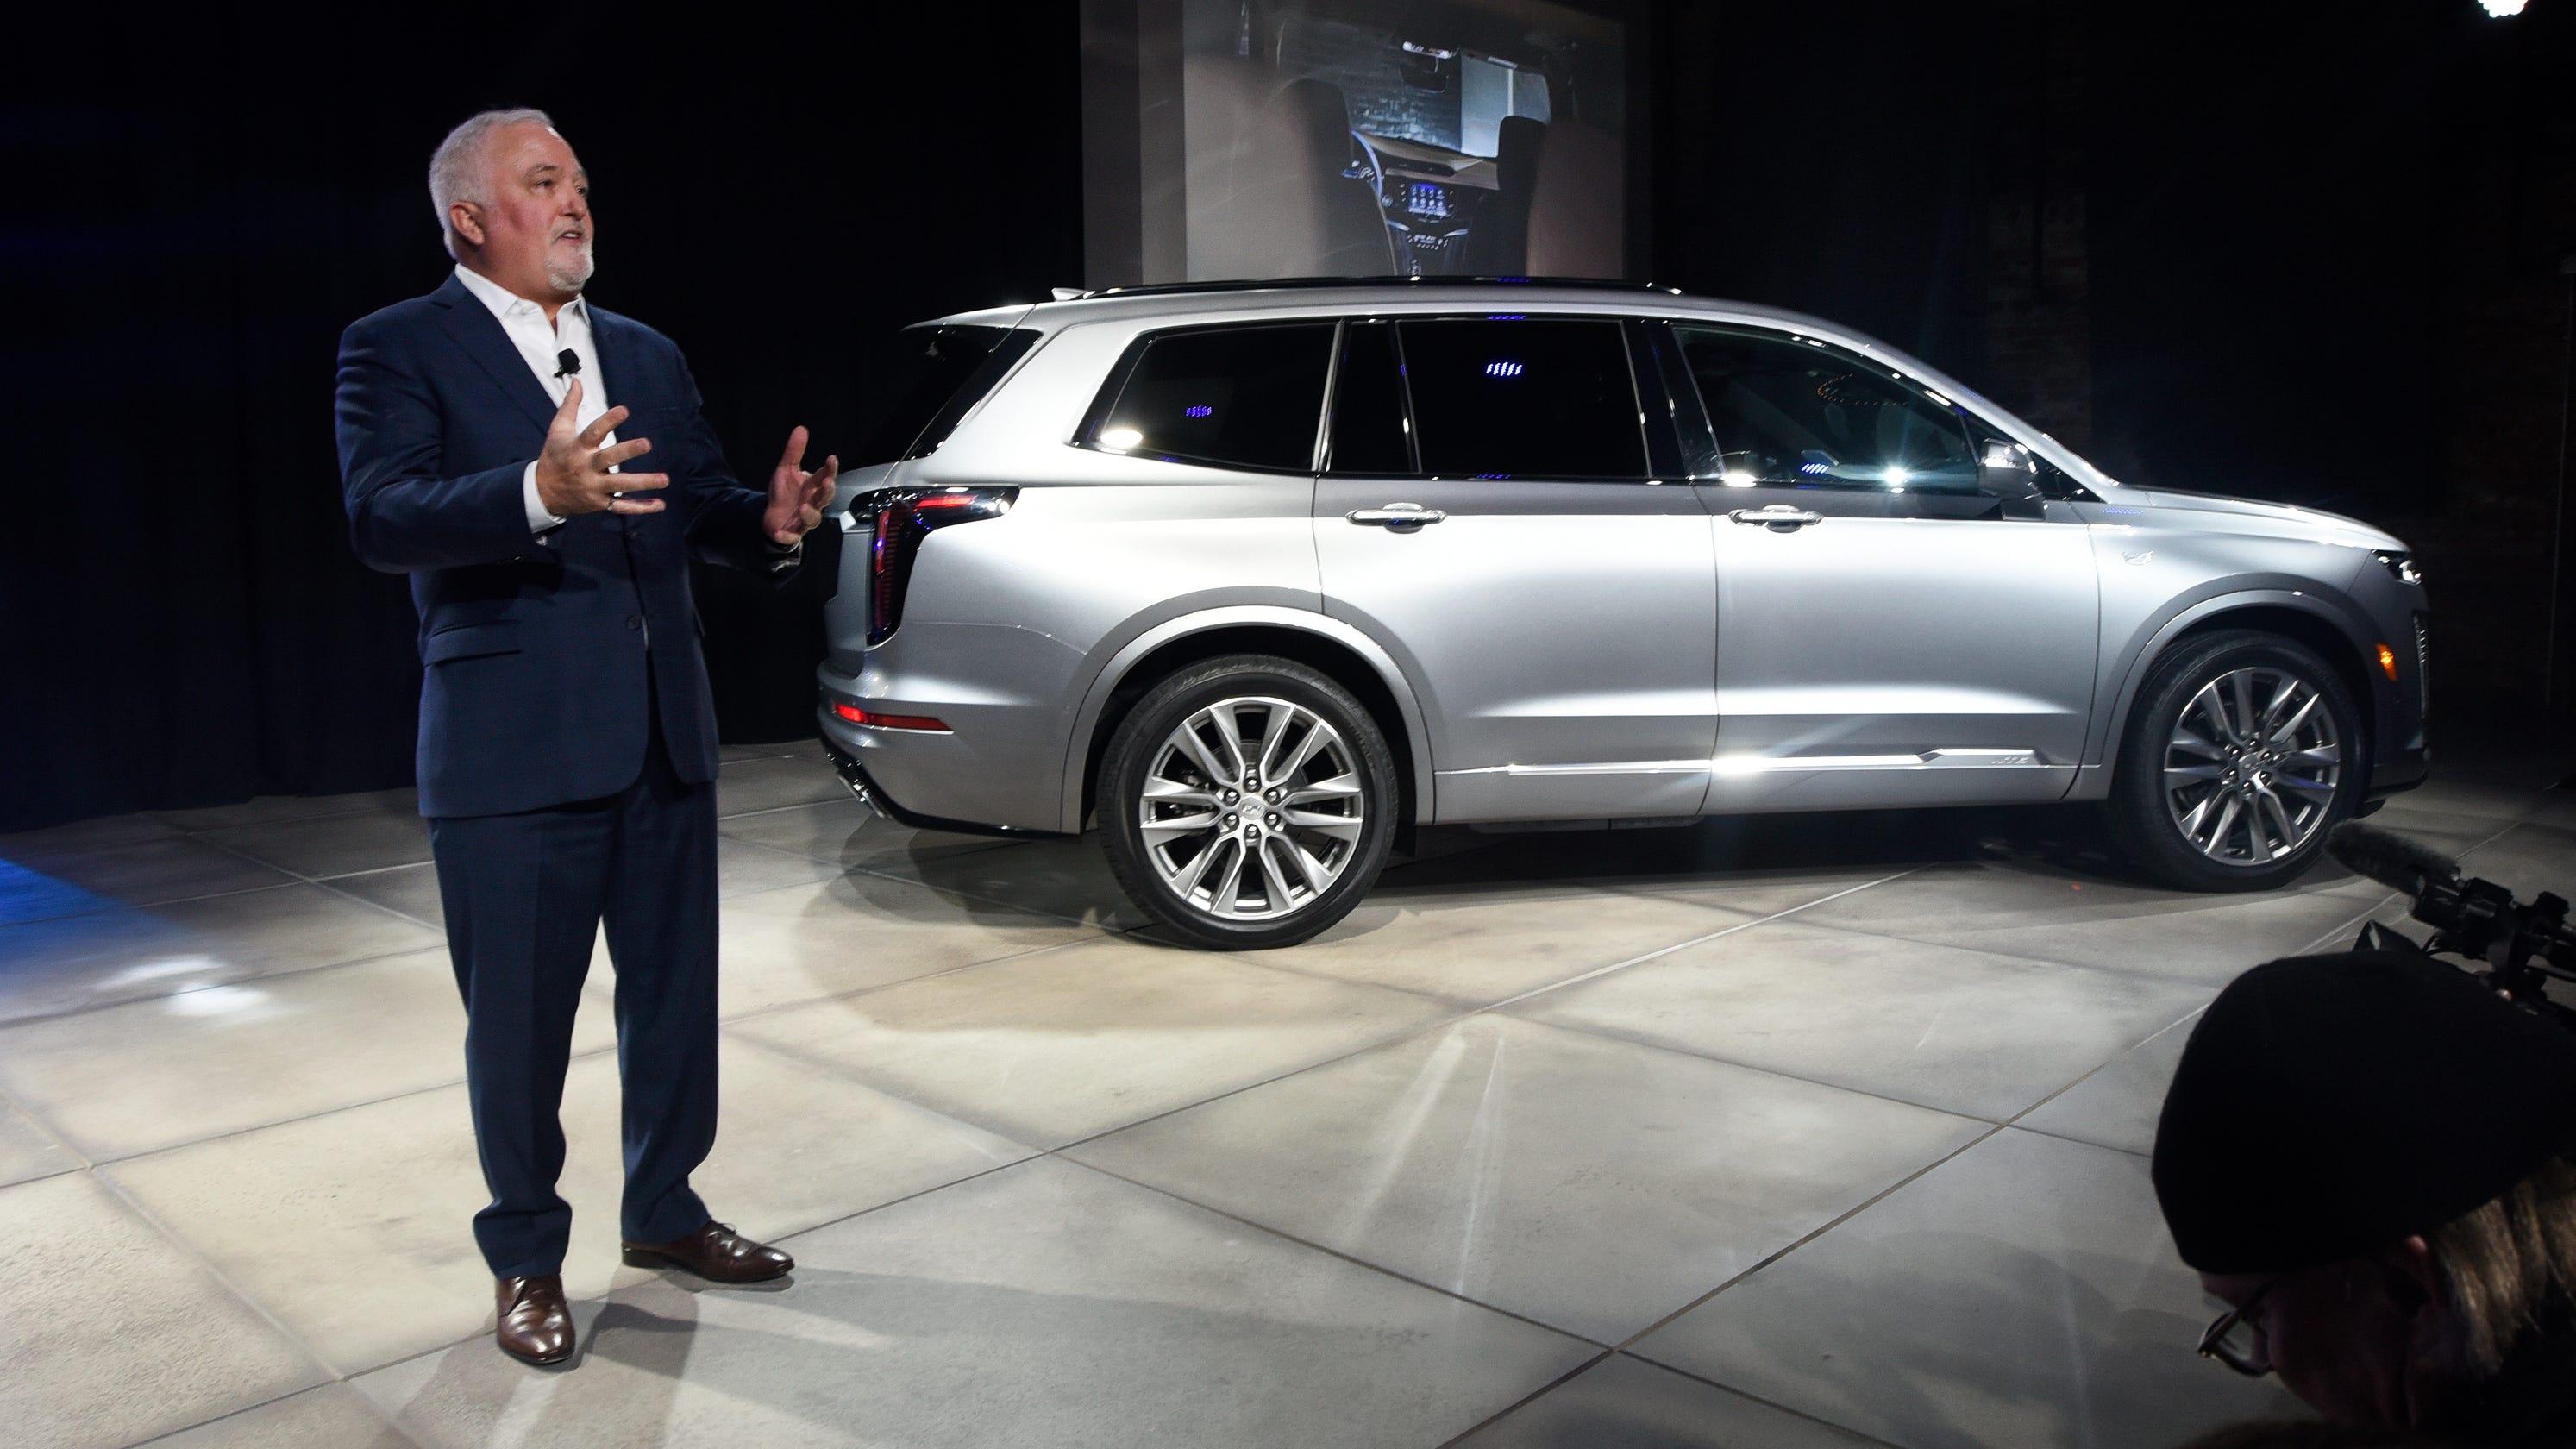 Cadillac S 3 Row Xt6 Makes Live Debut Ahead Of Detroit Auto Show